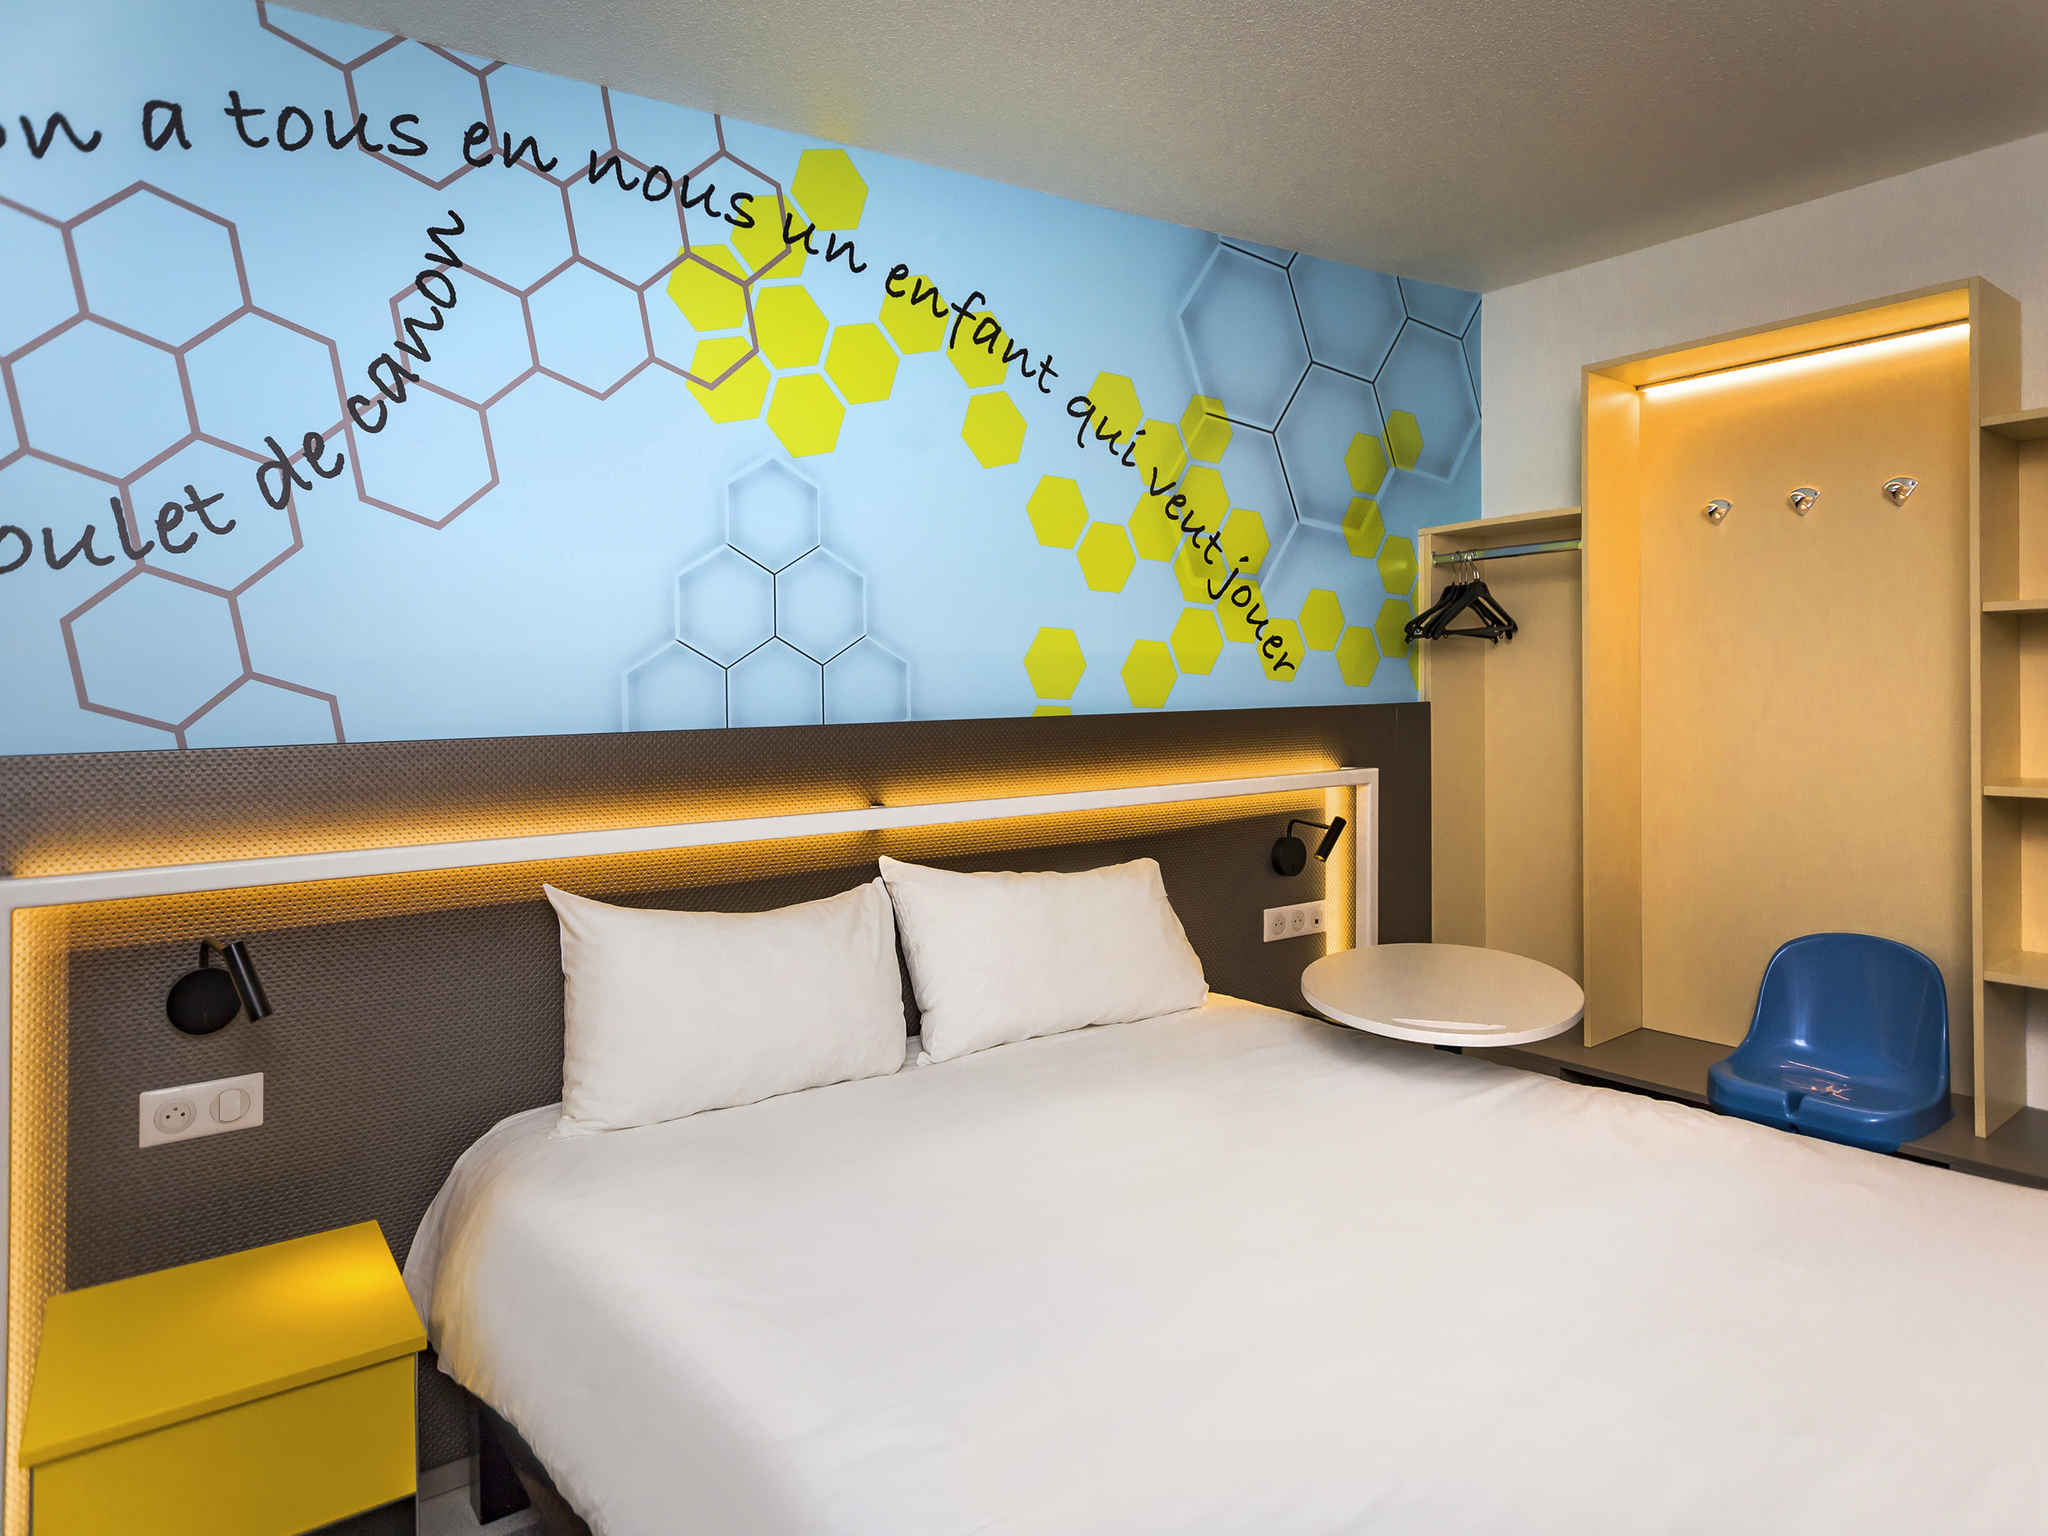 Отель — ibis Styles Страсбург Стад Де Ла Мено